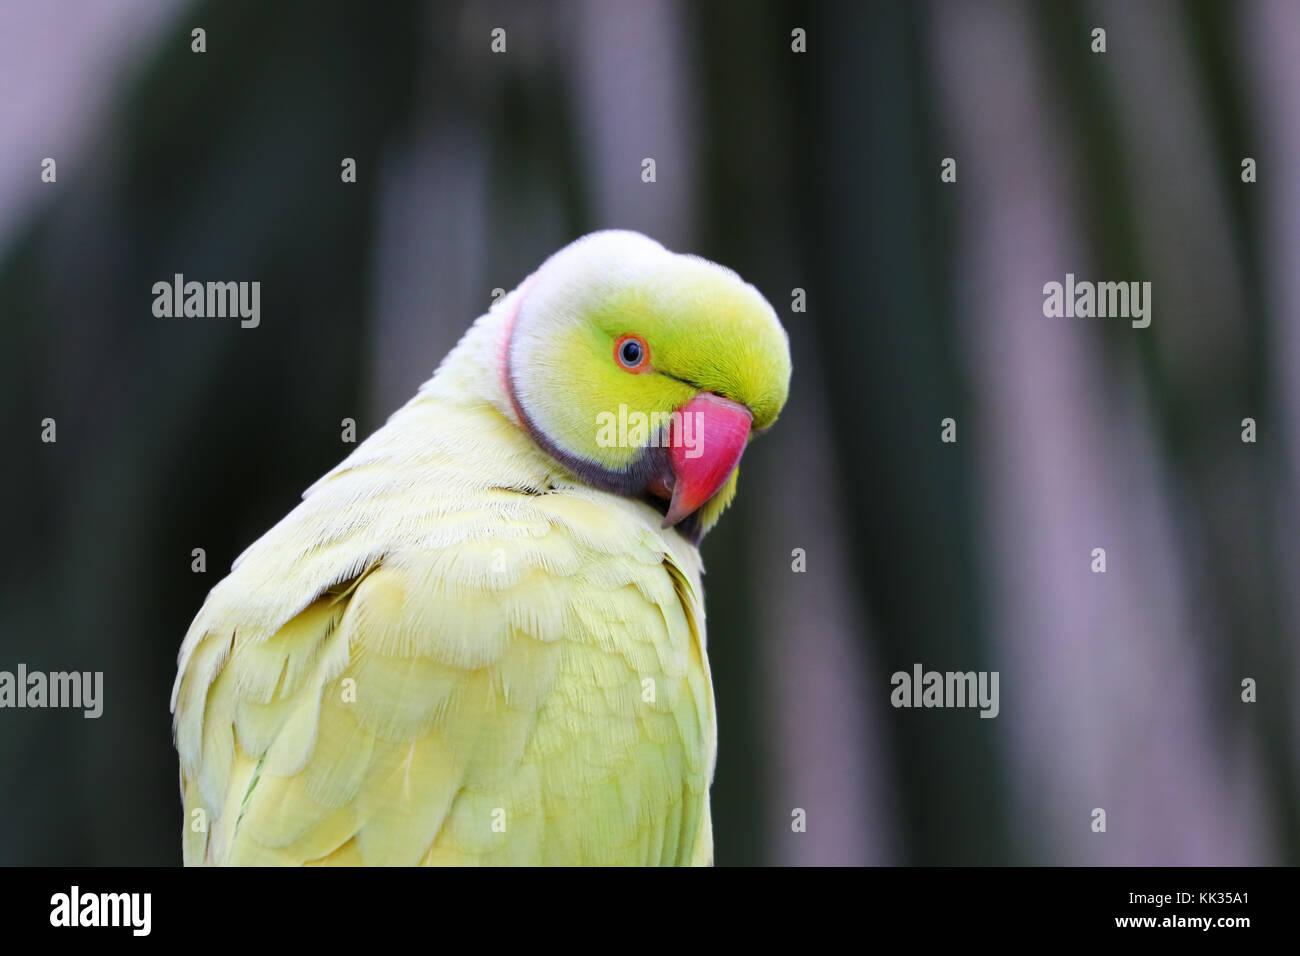 Closeup of a parrot, South Africa - Stock Image